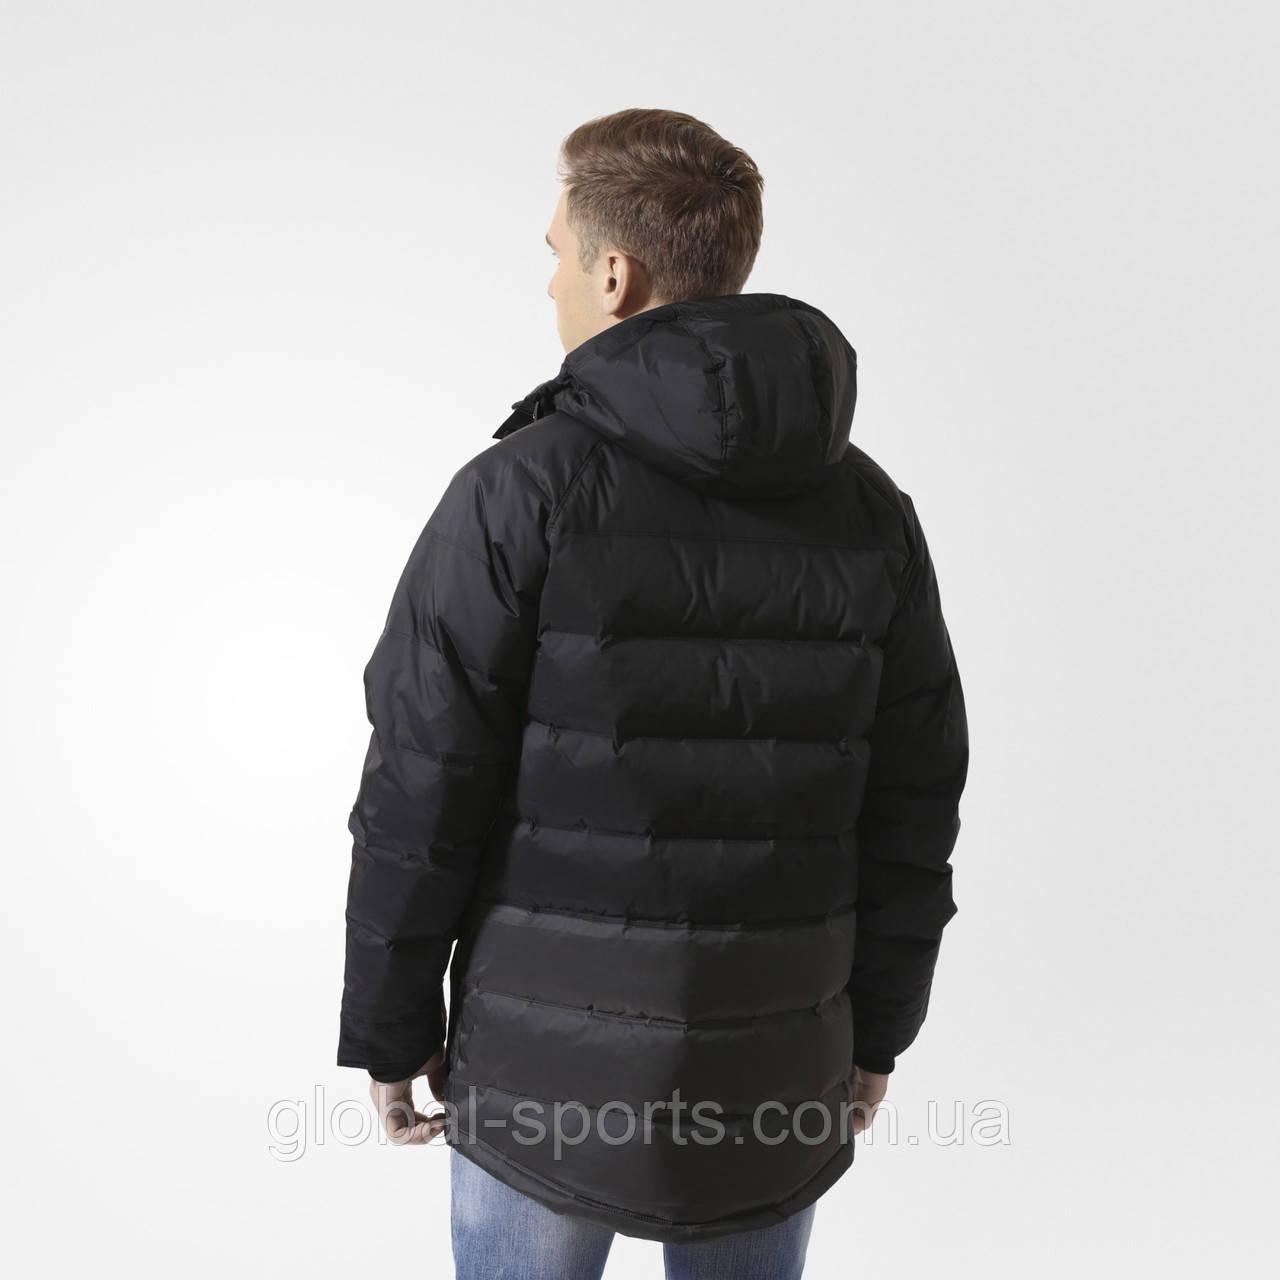 48c5adfee7809 Мужской пуховик Adidas Down Jacket, (Артикул:AY8787): продажа, цена ...